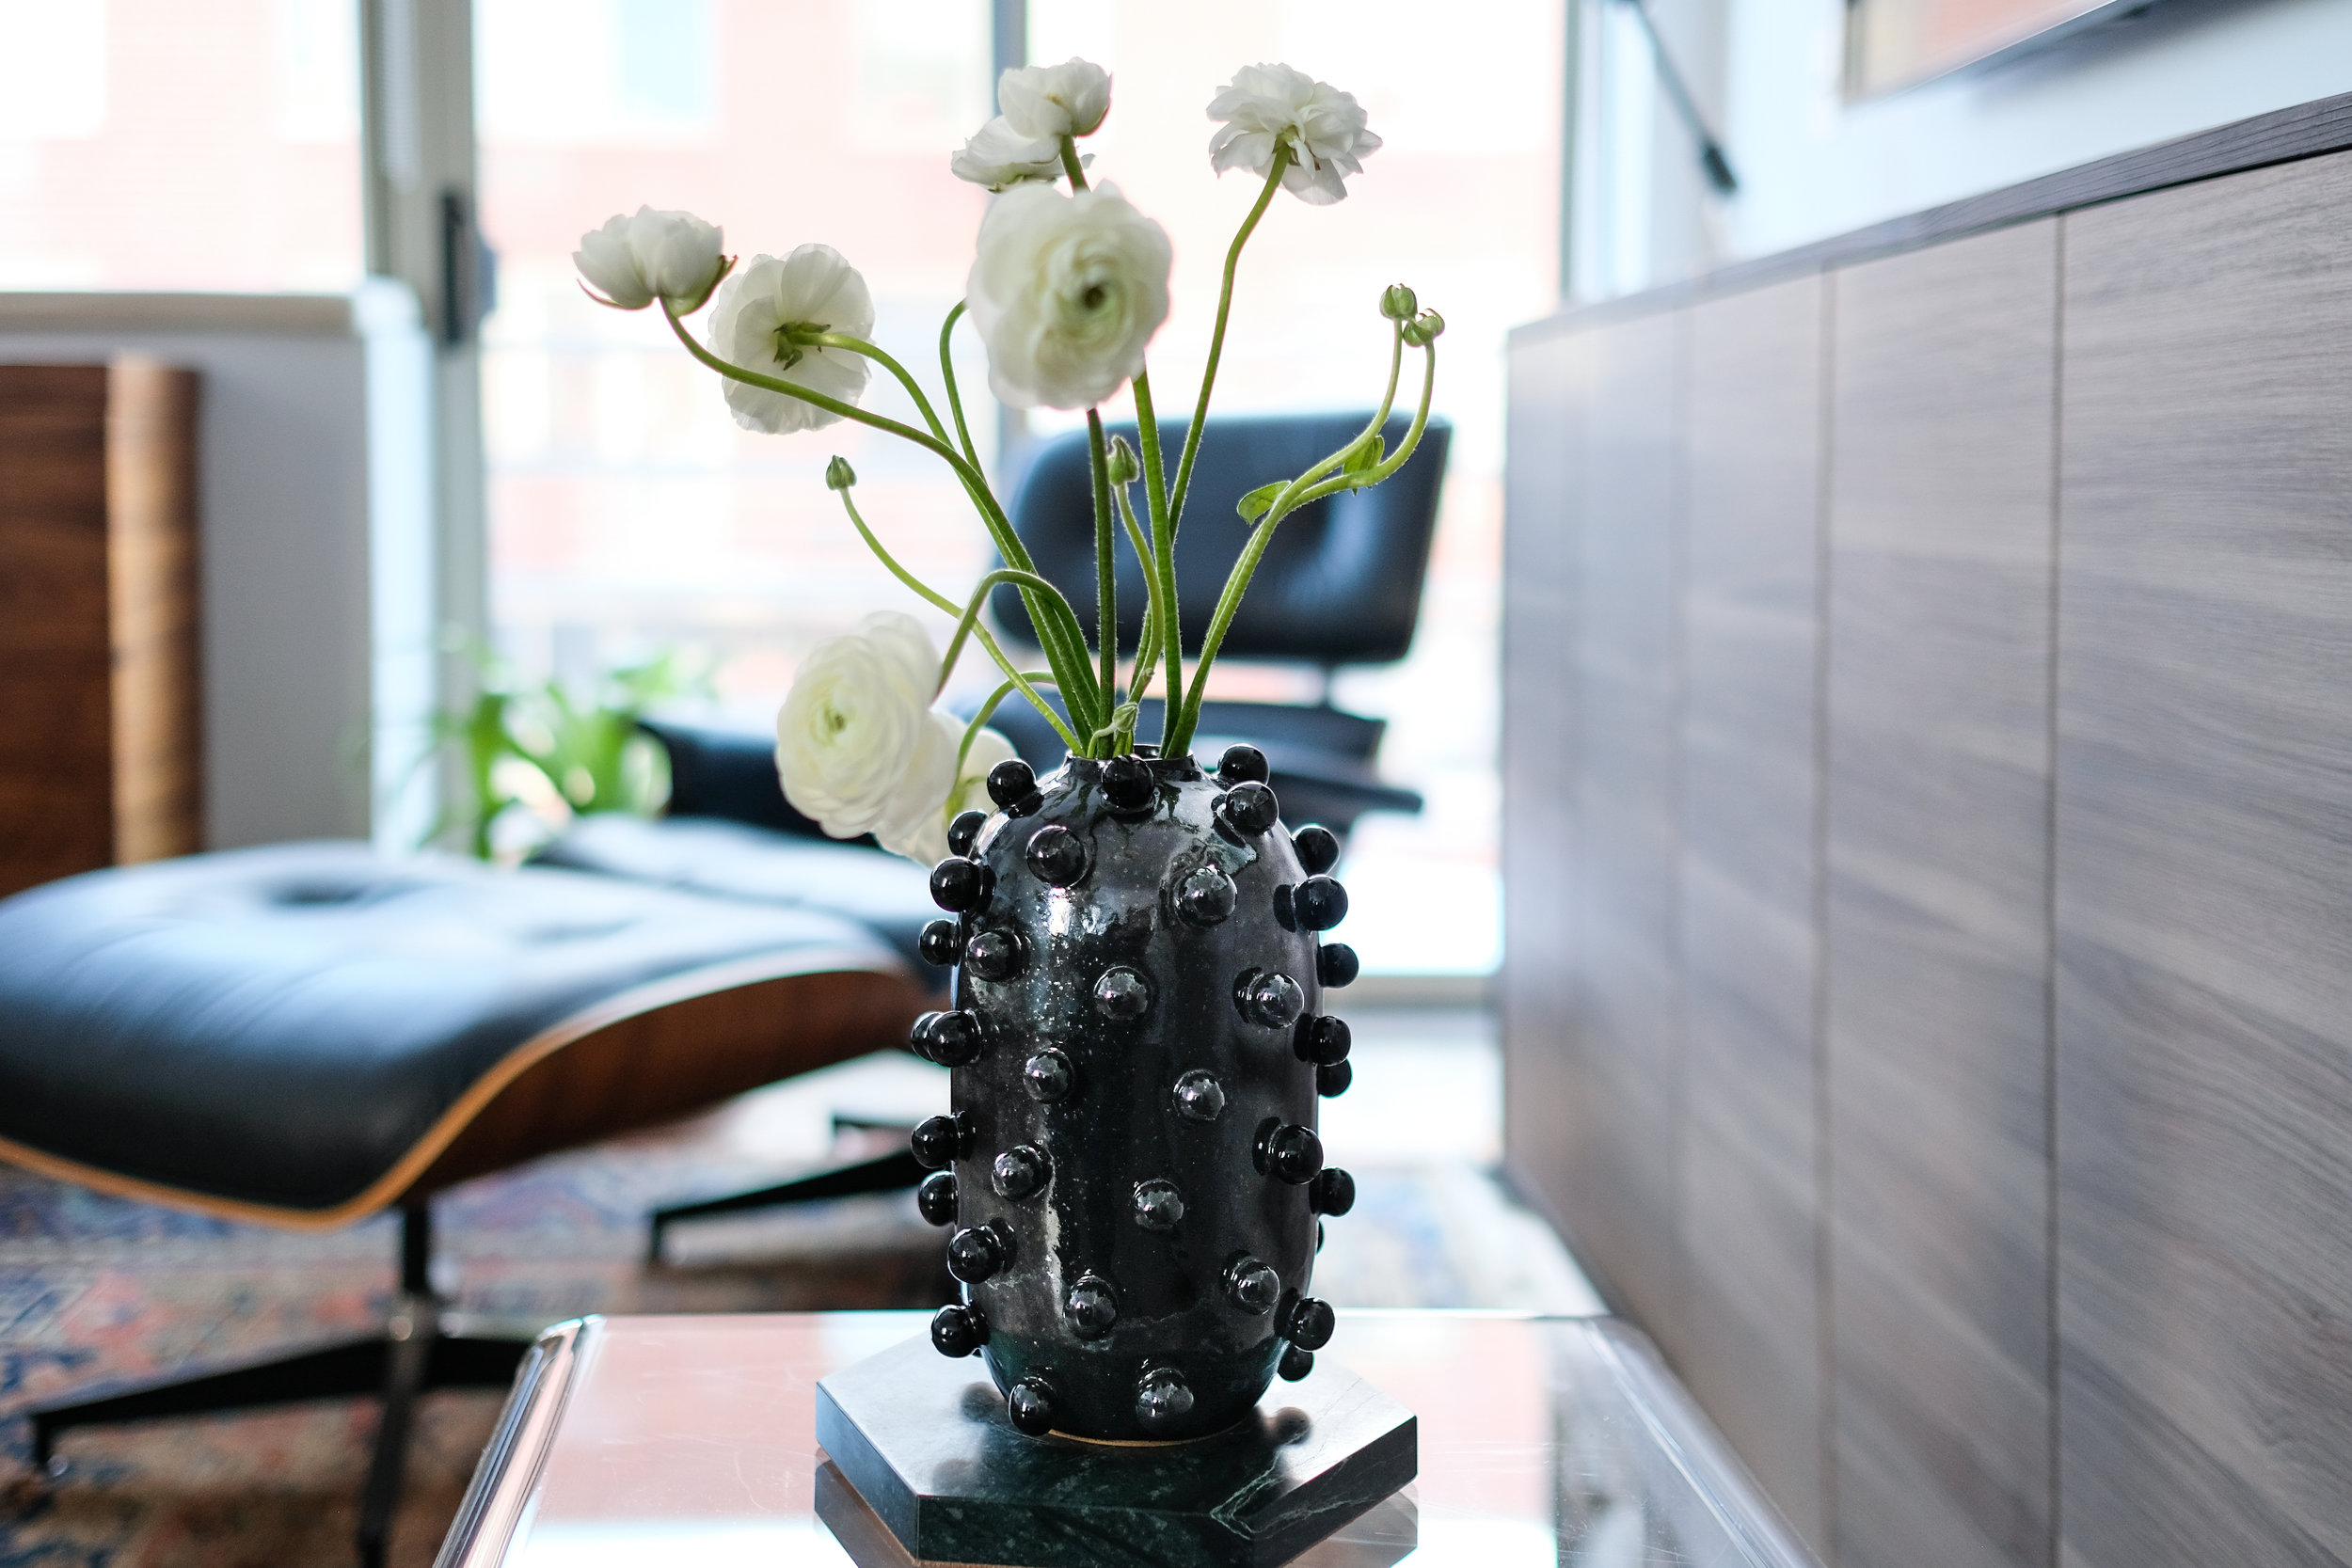 All time favorite vase from  ZZ Ceramics .